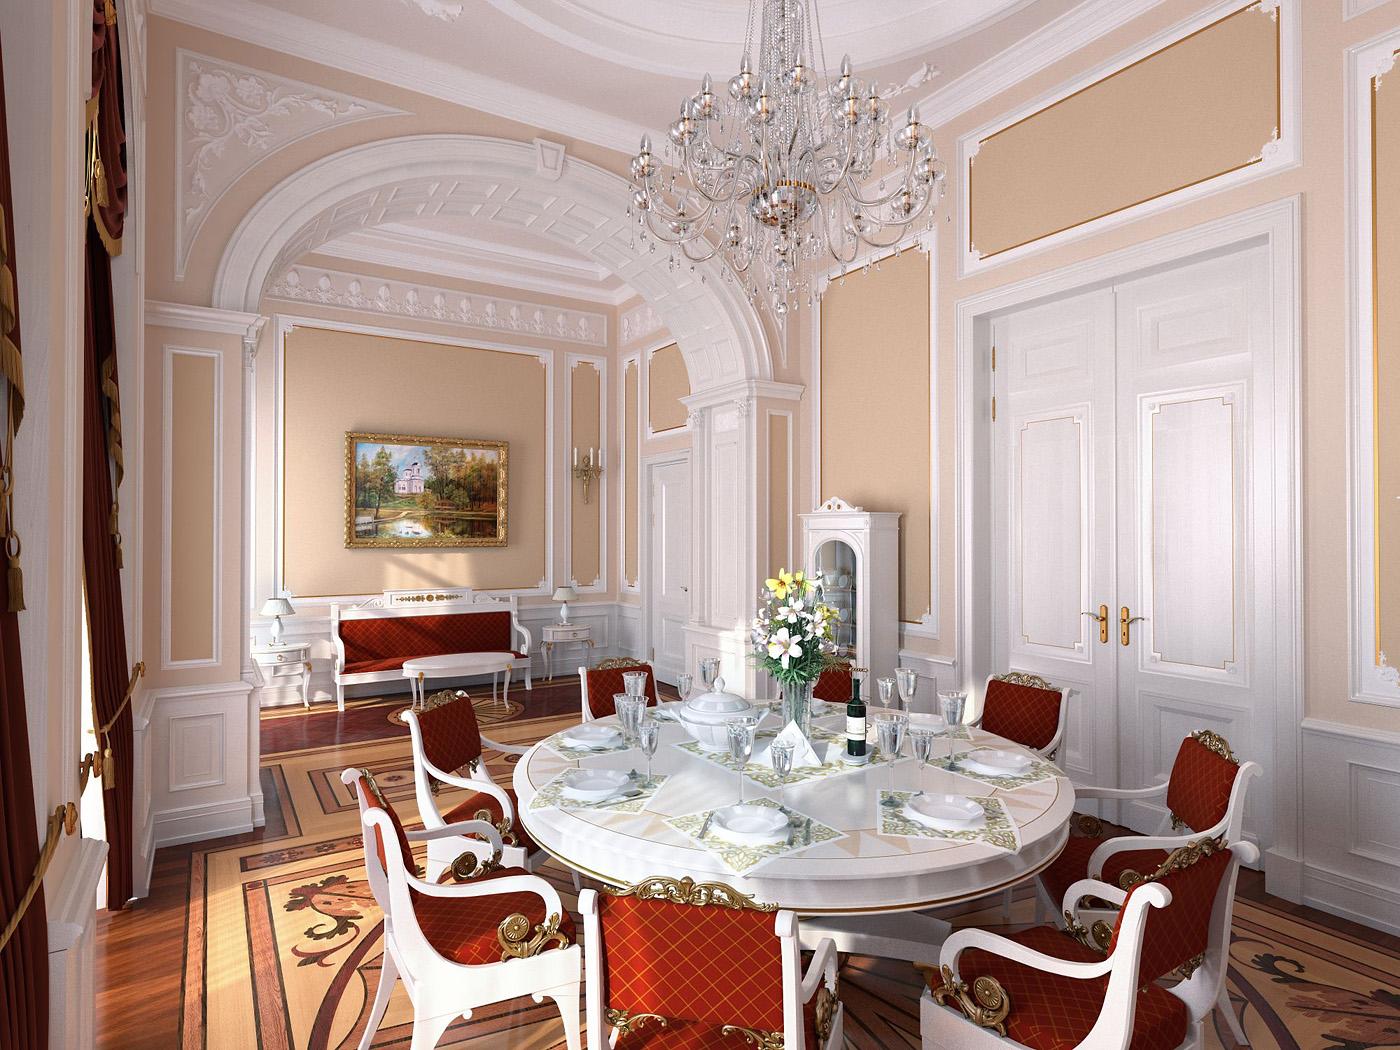 dining room cam 1